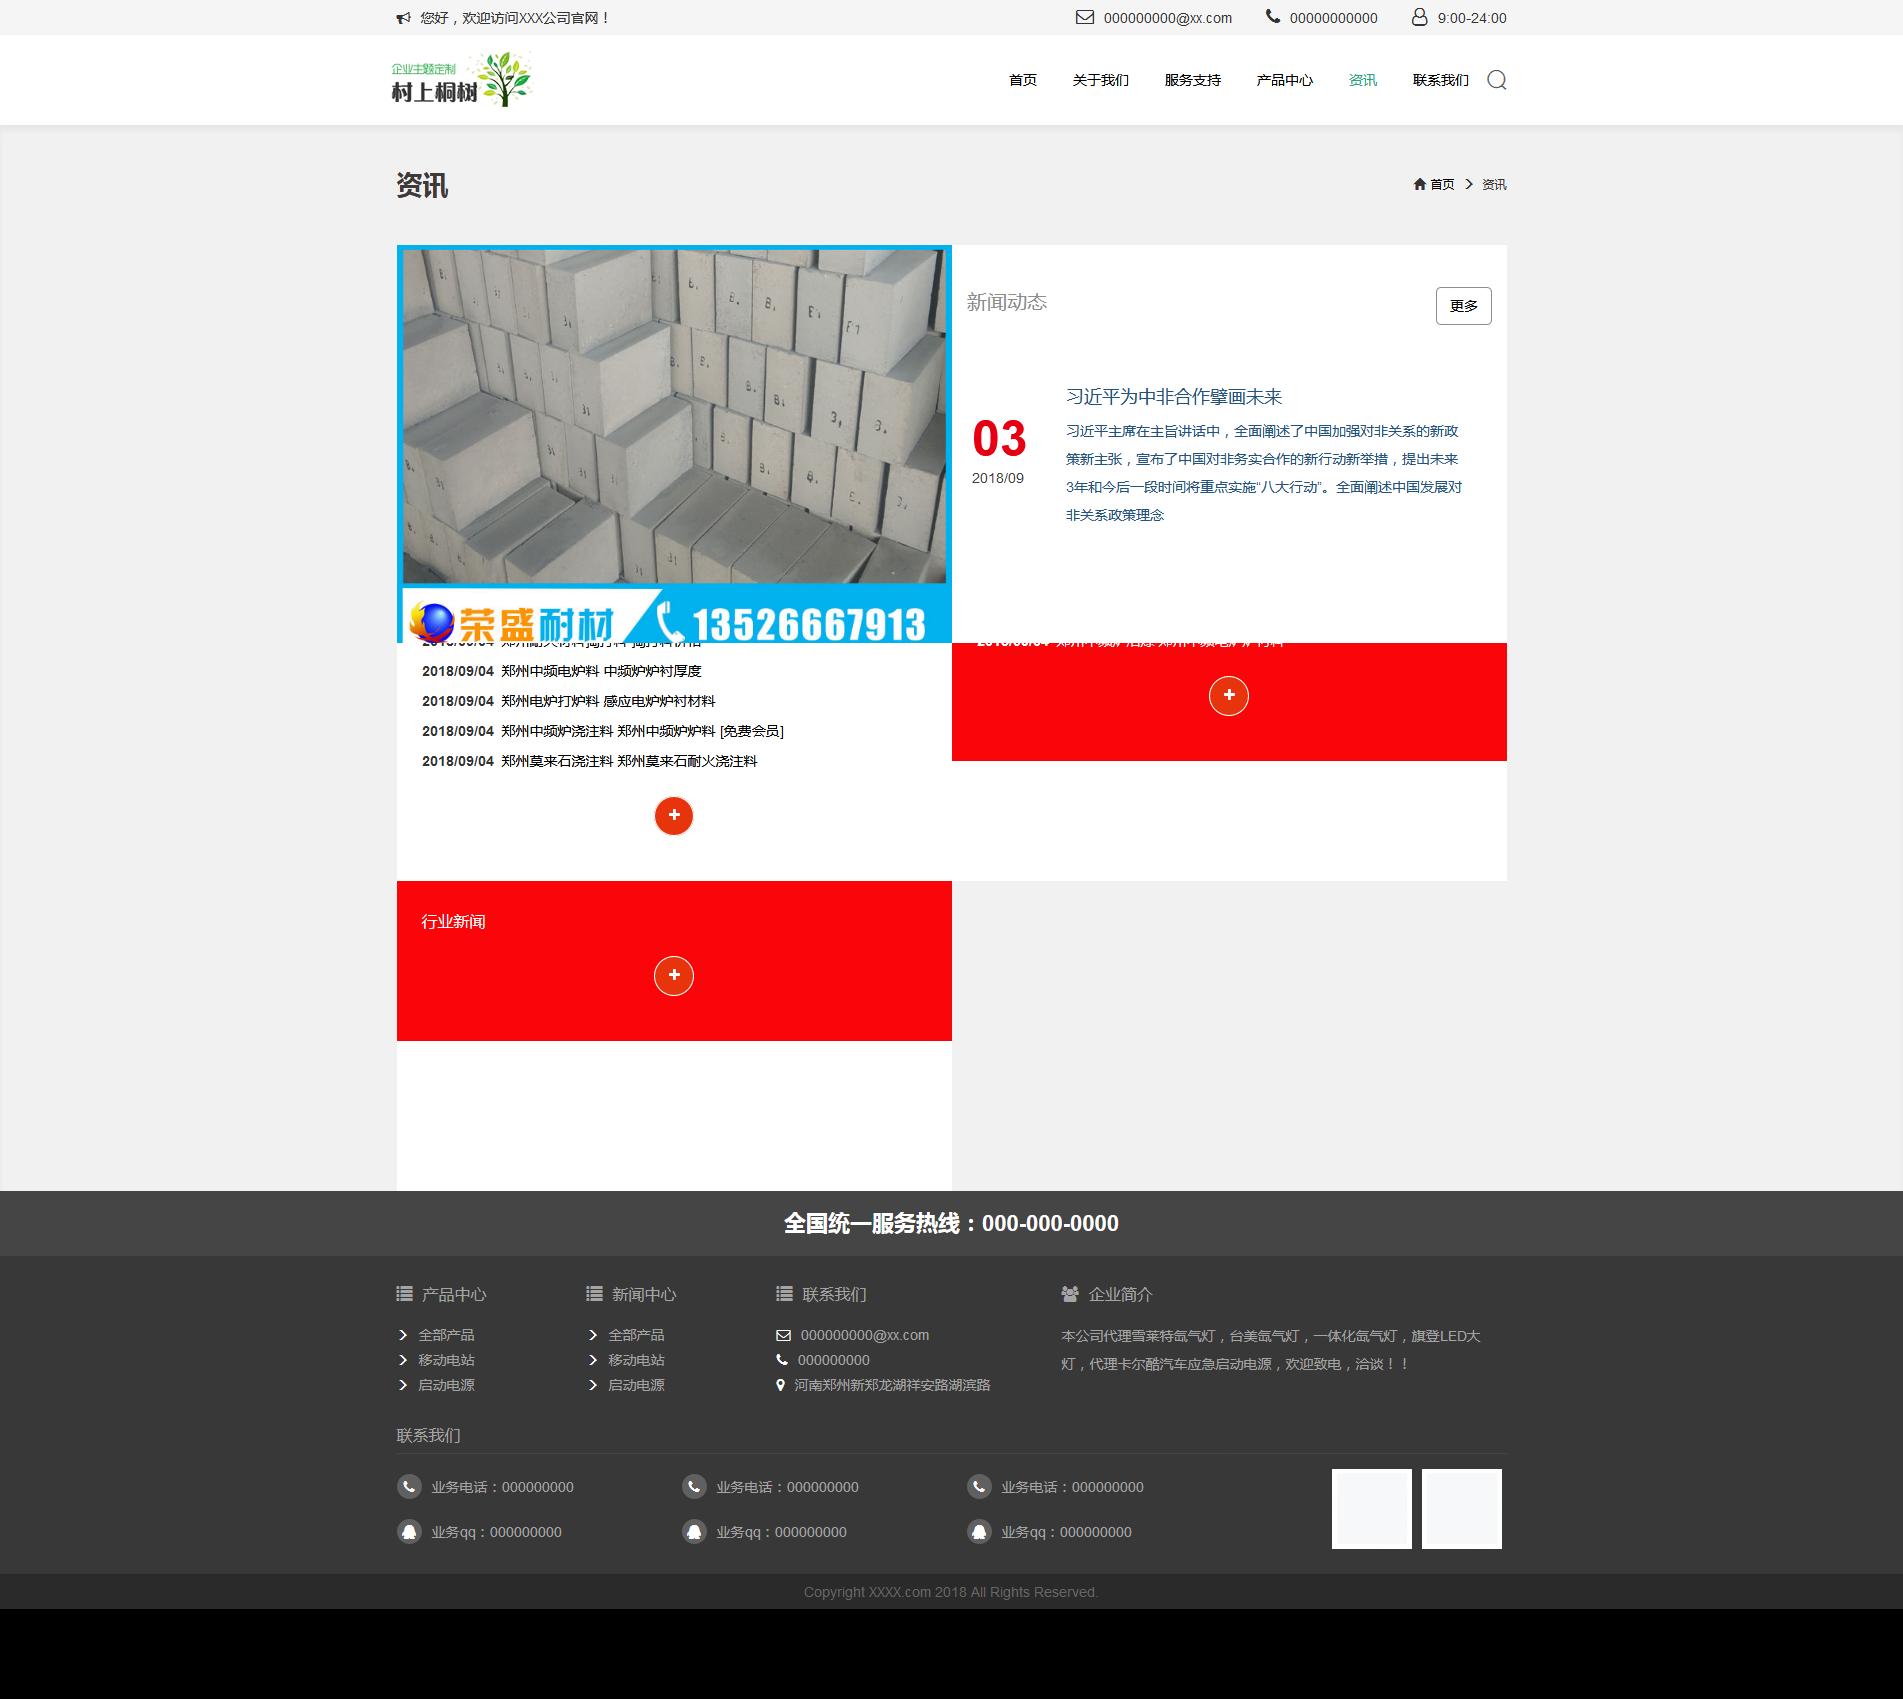 wordpress免费主题下载,网盘链接,适合企业网站